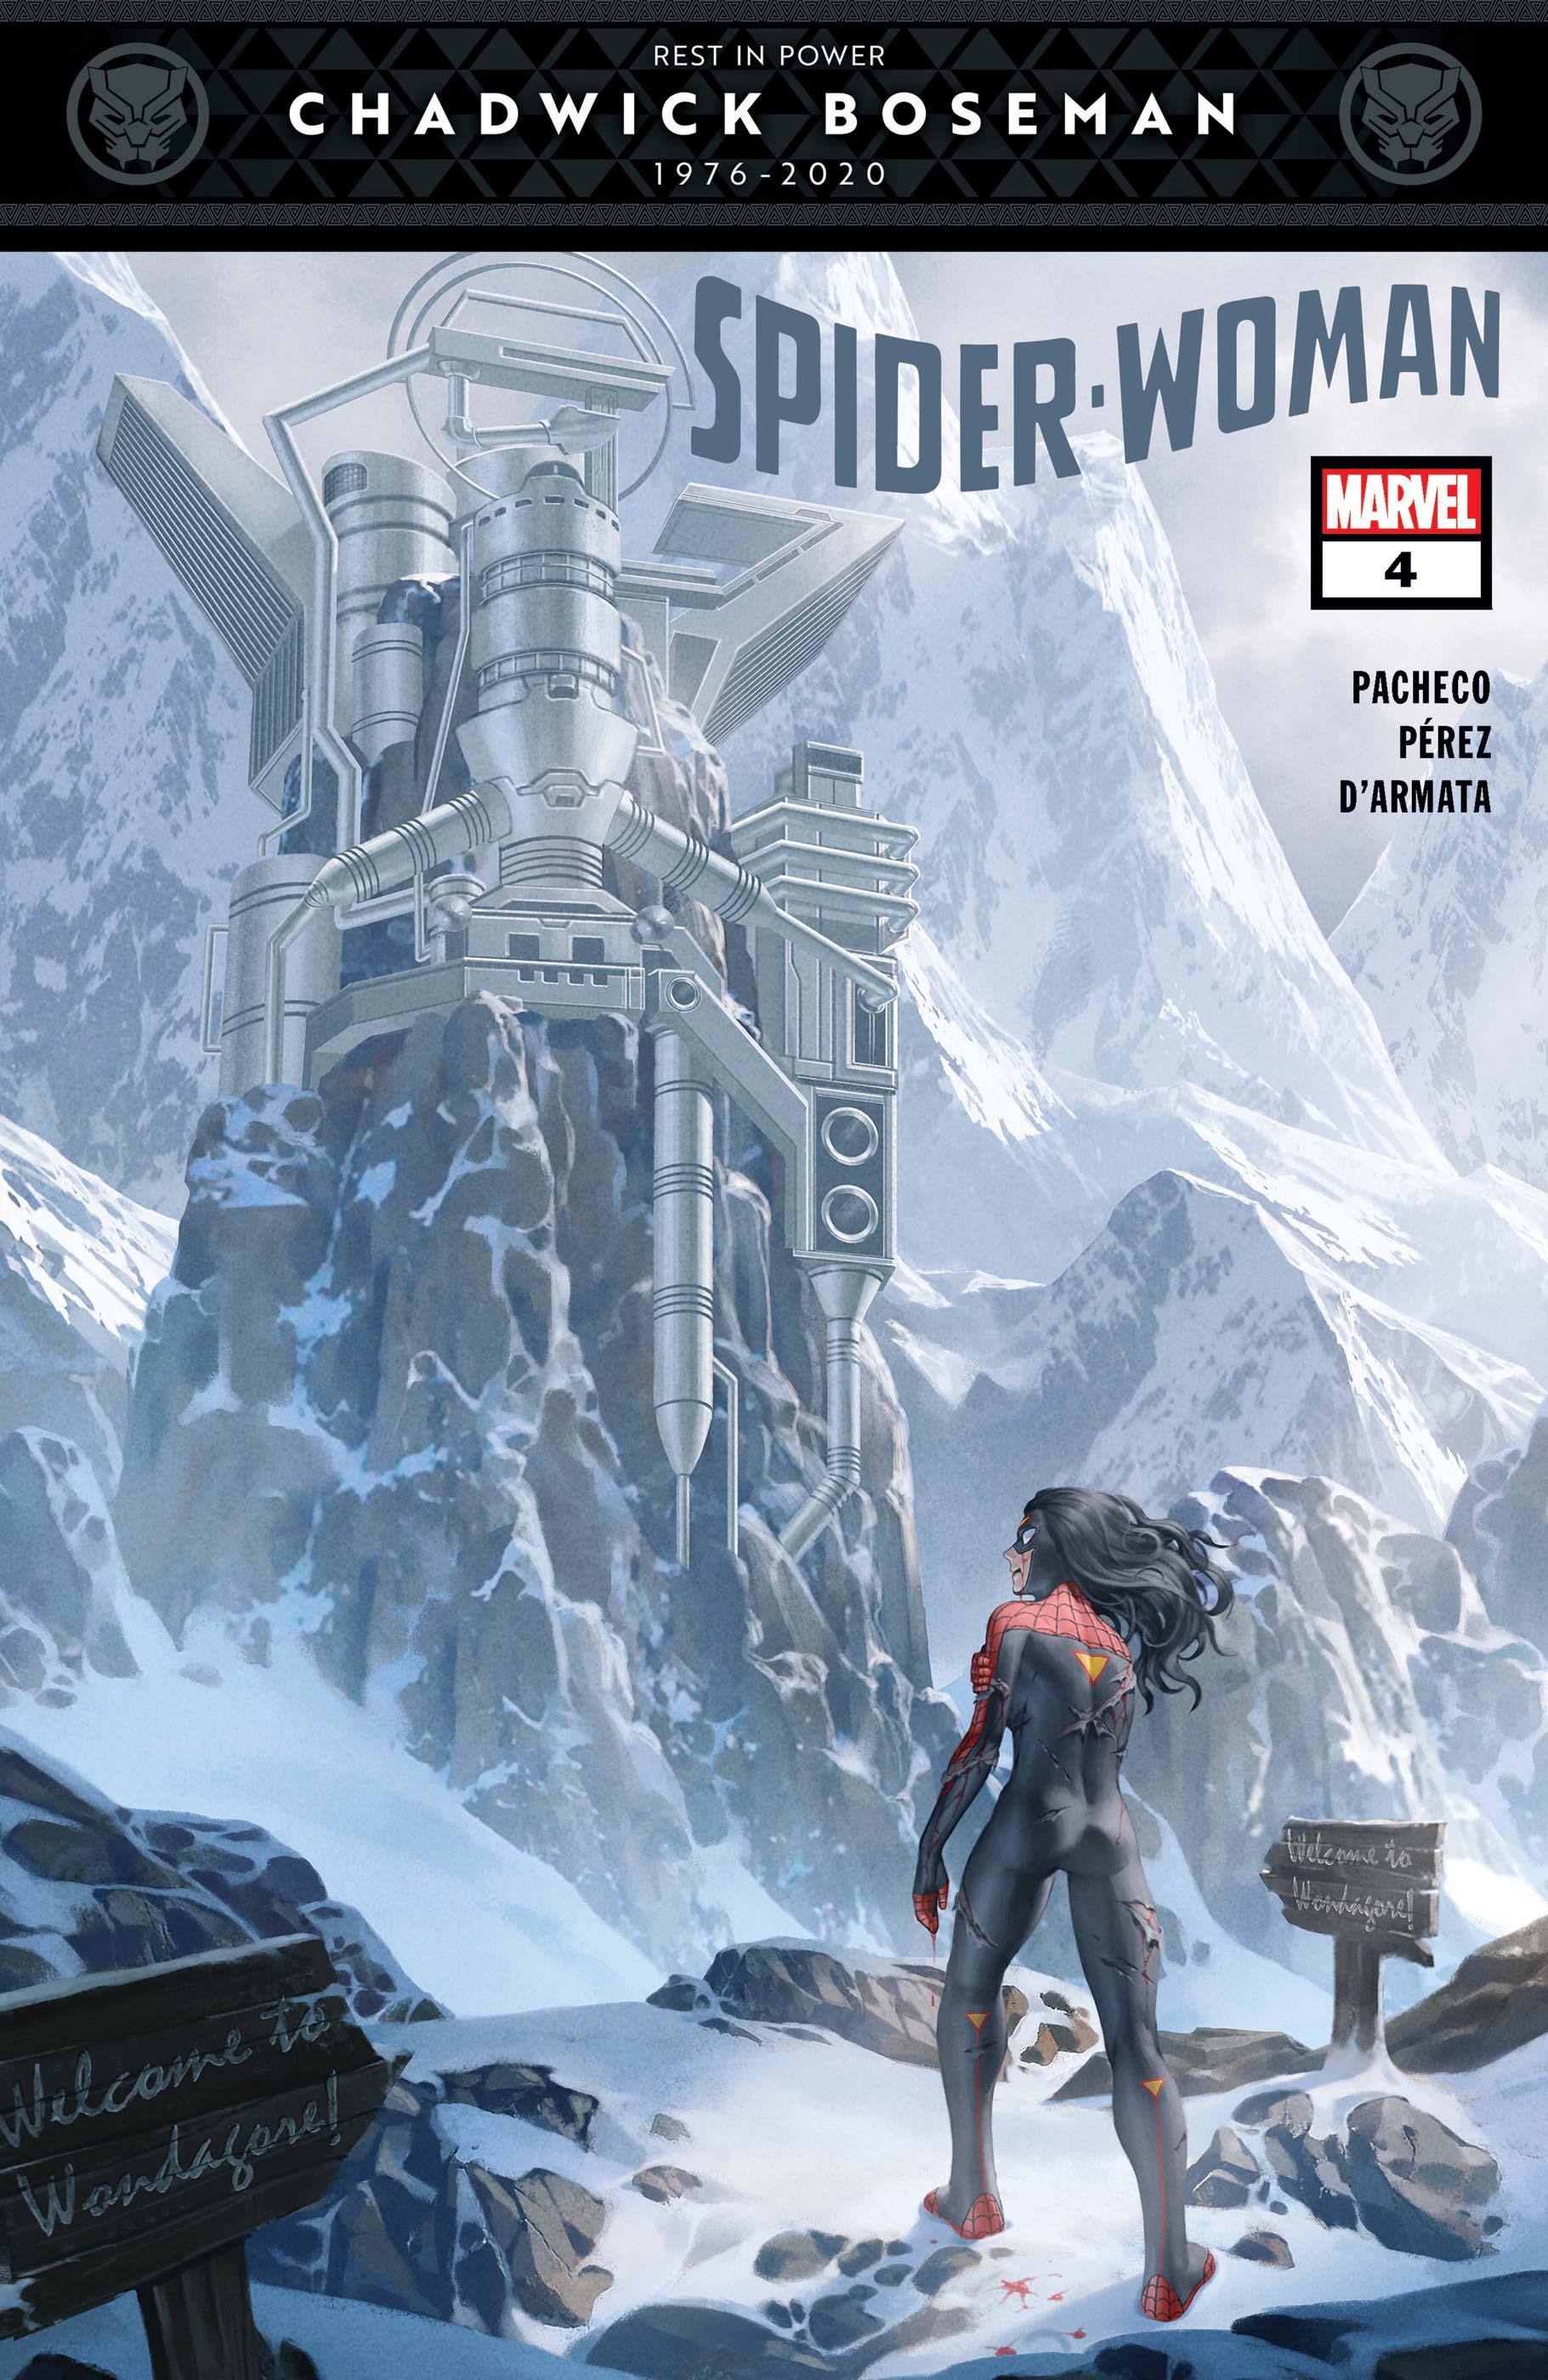 Spider-Woman (2020) #4